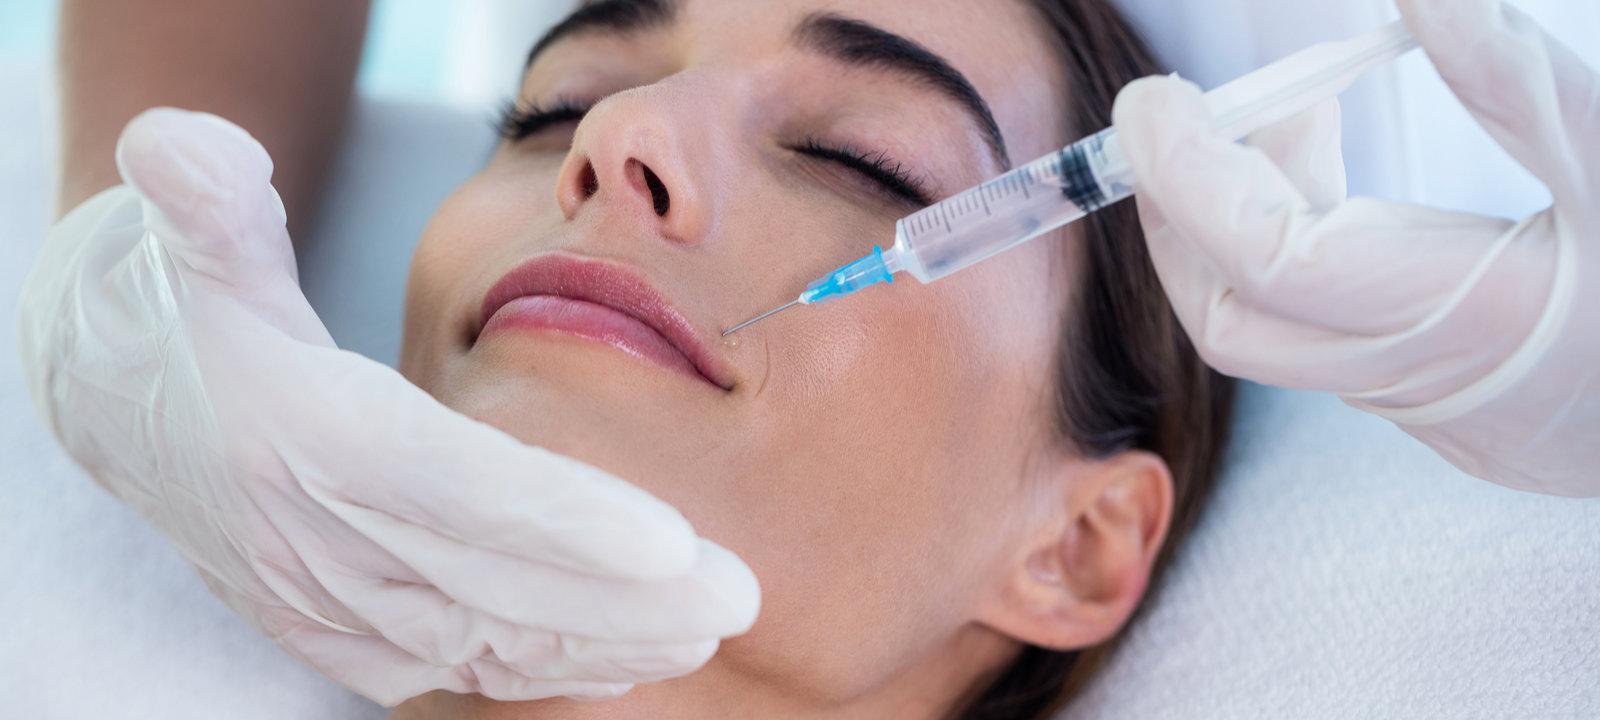 Woman-receiving-botox-injection